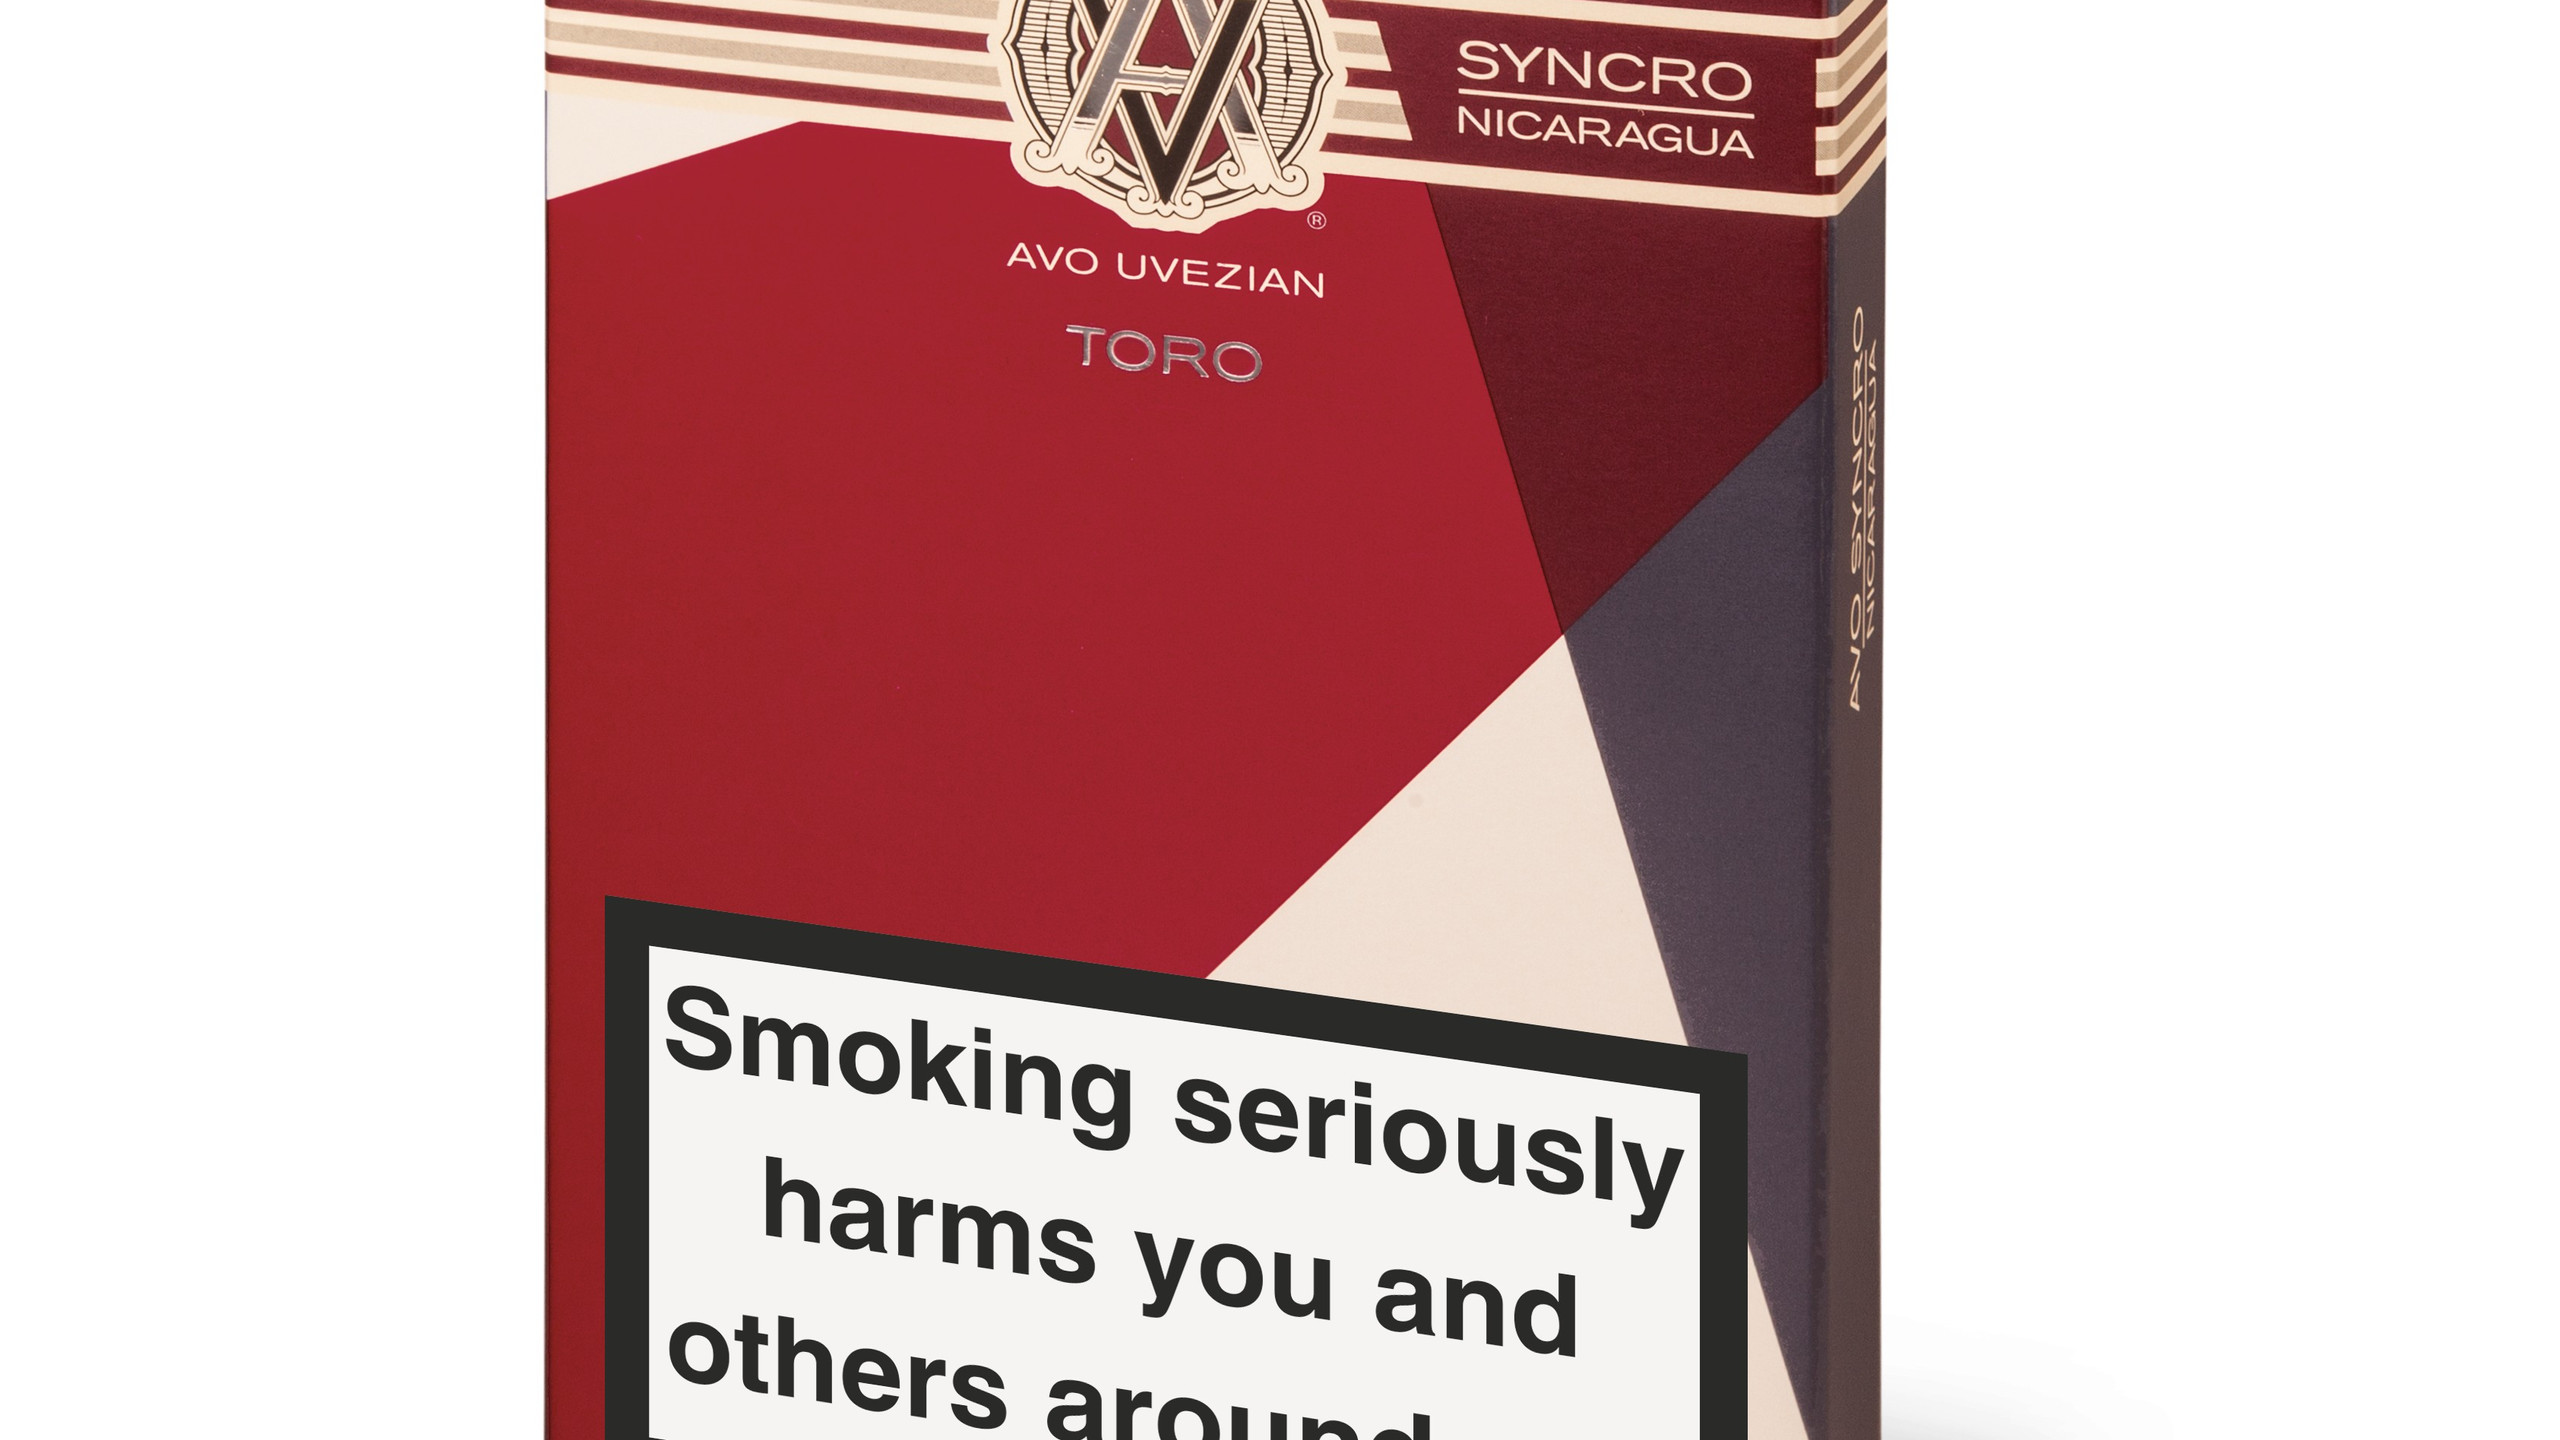 Avo Syncro Nicaragua cigar pack